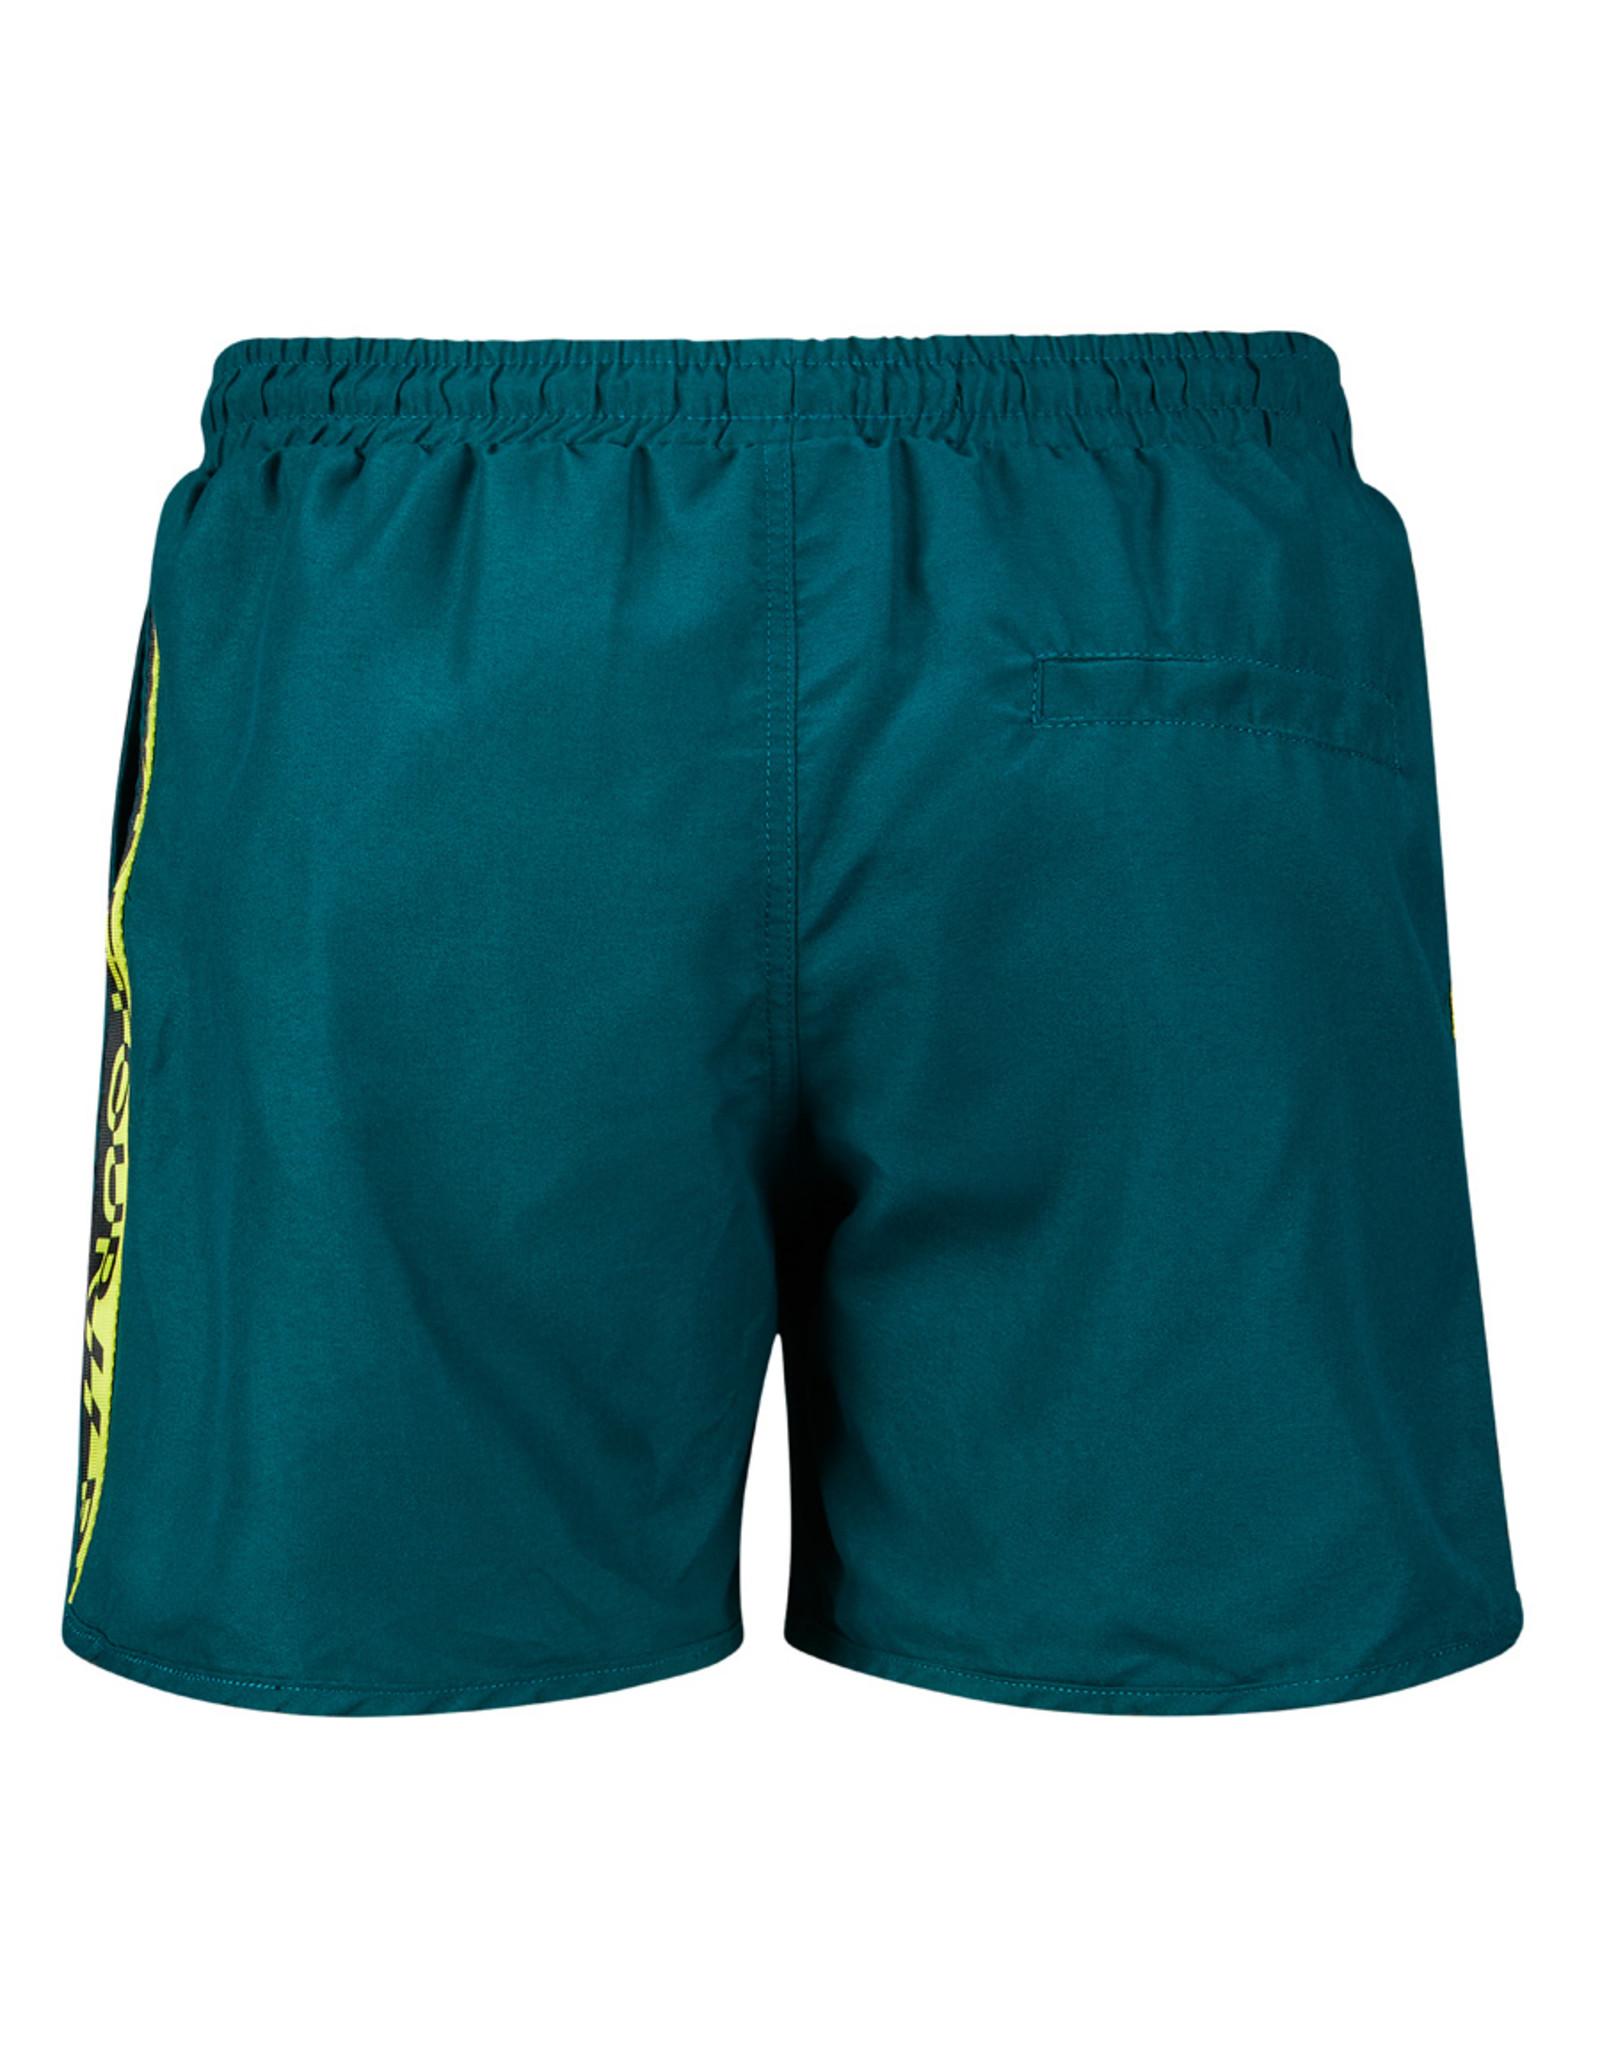 Retour Jeans Swimwear Tyson Short Teal